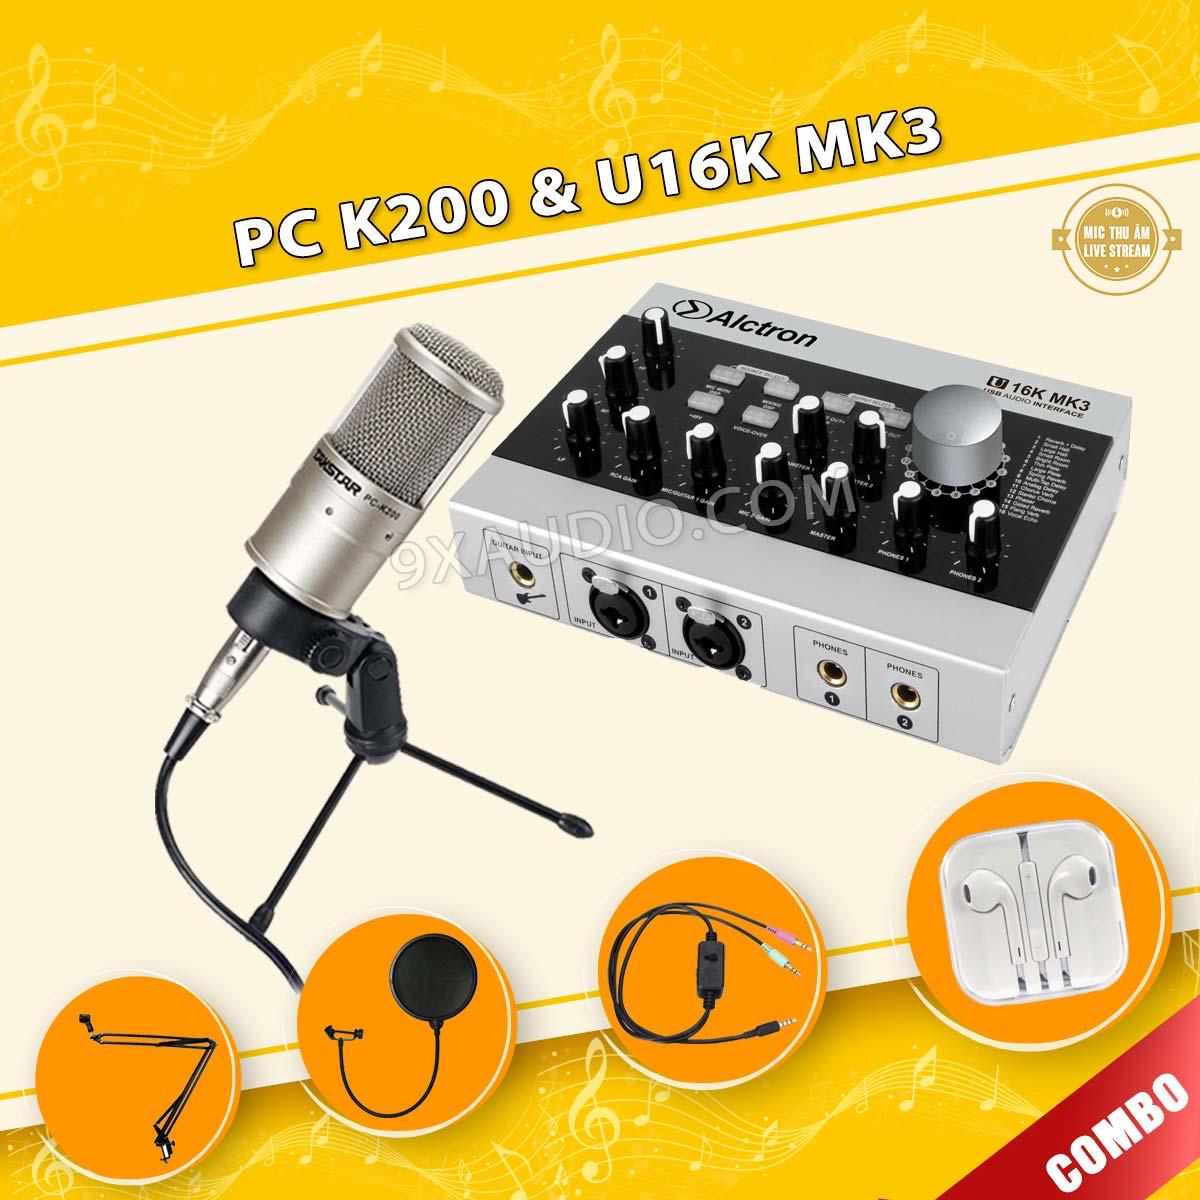 mic thu âm pc k200 u16k mk3 full 106